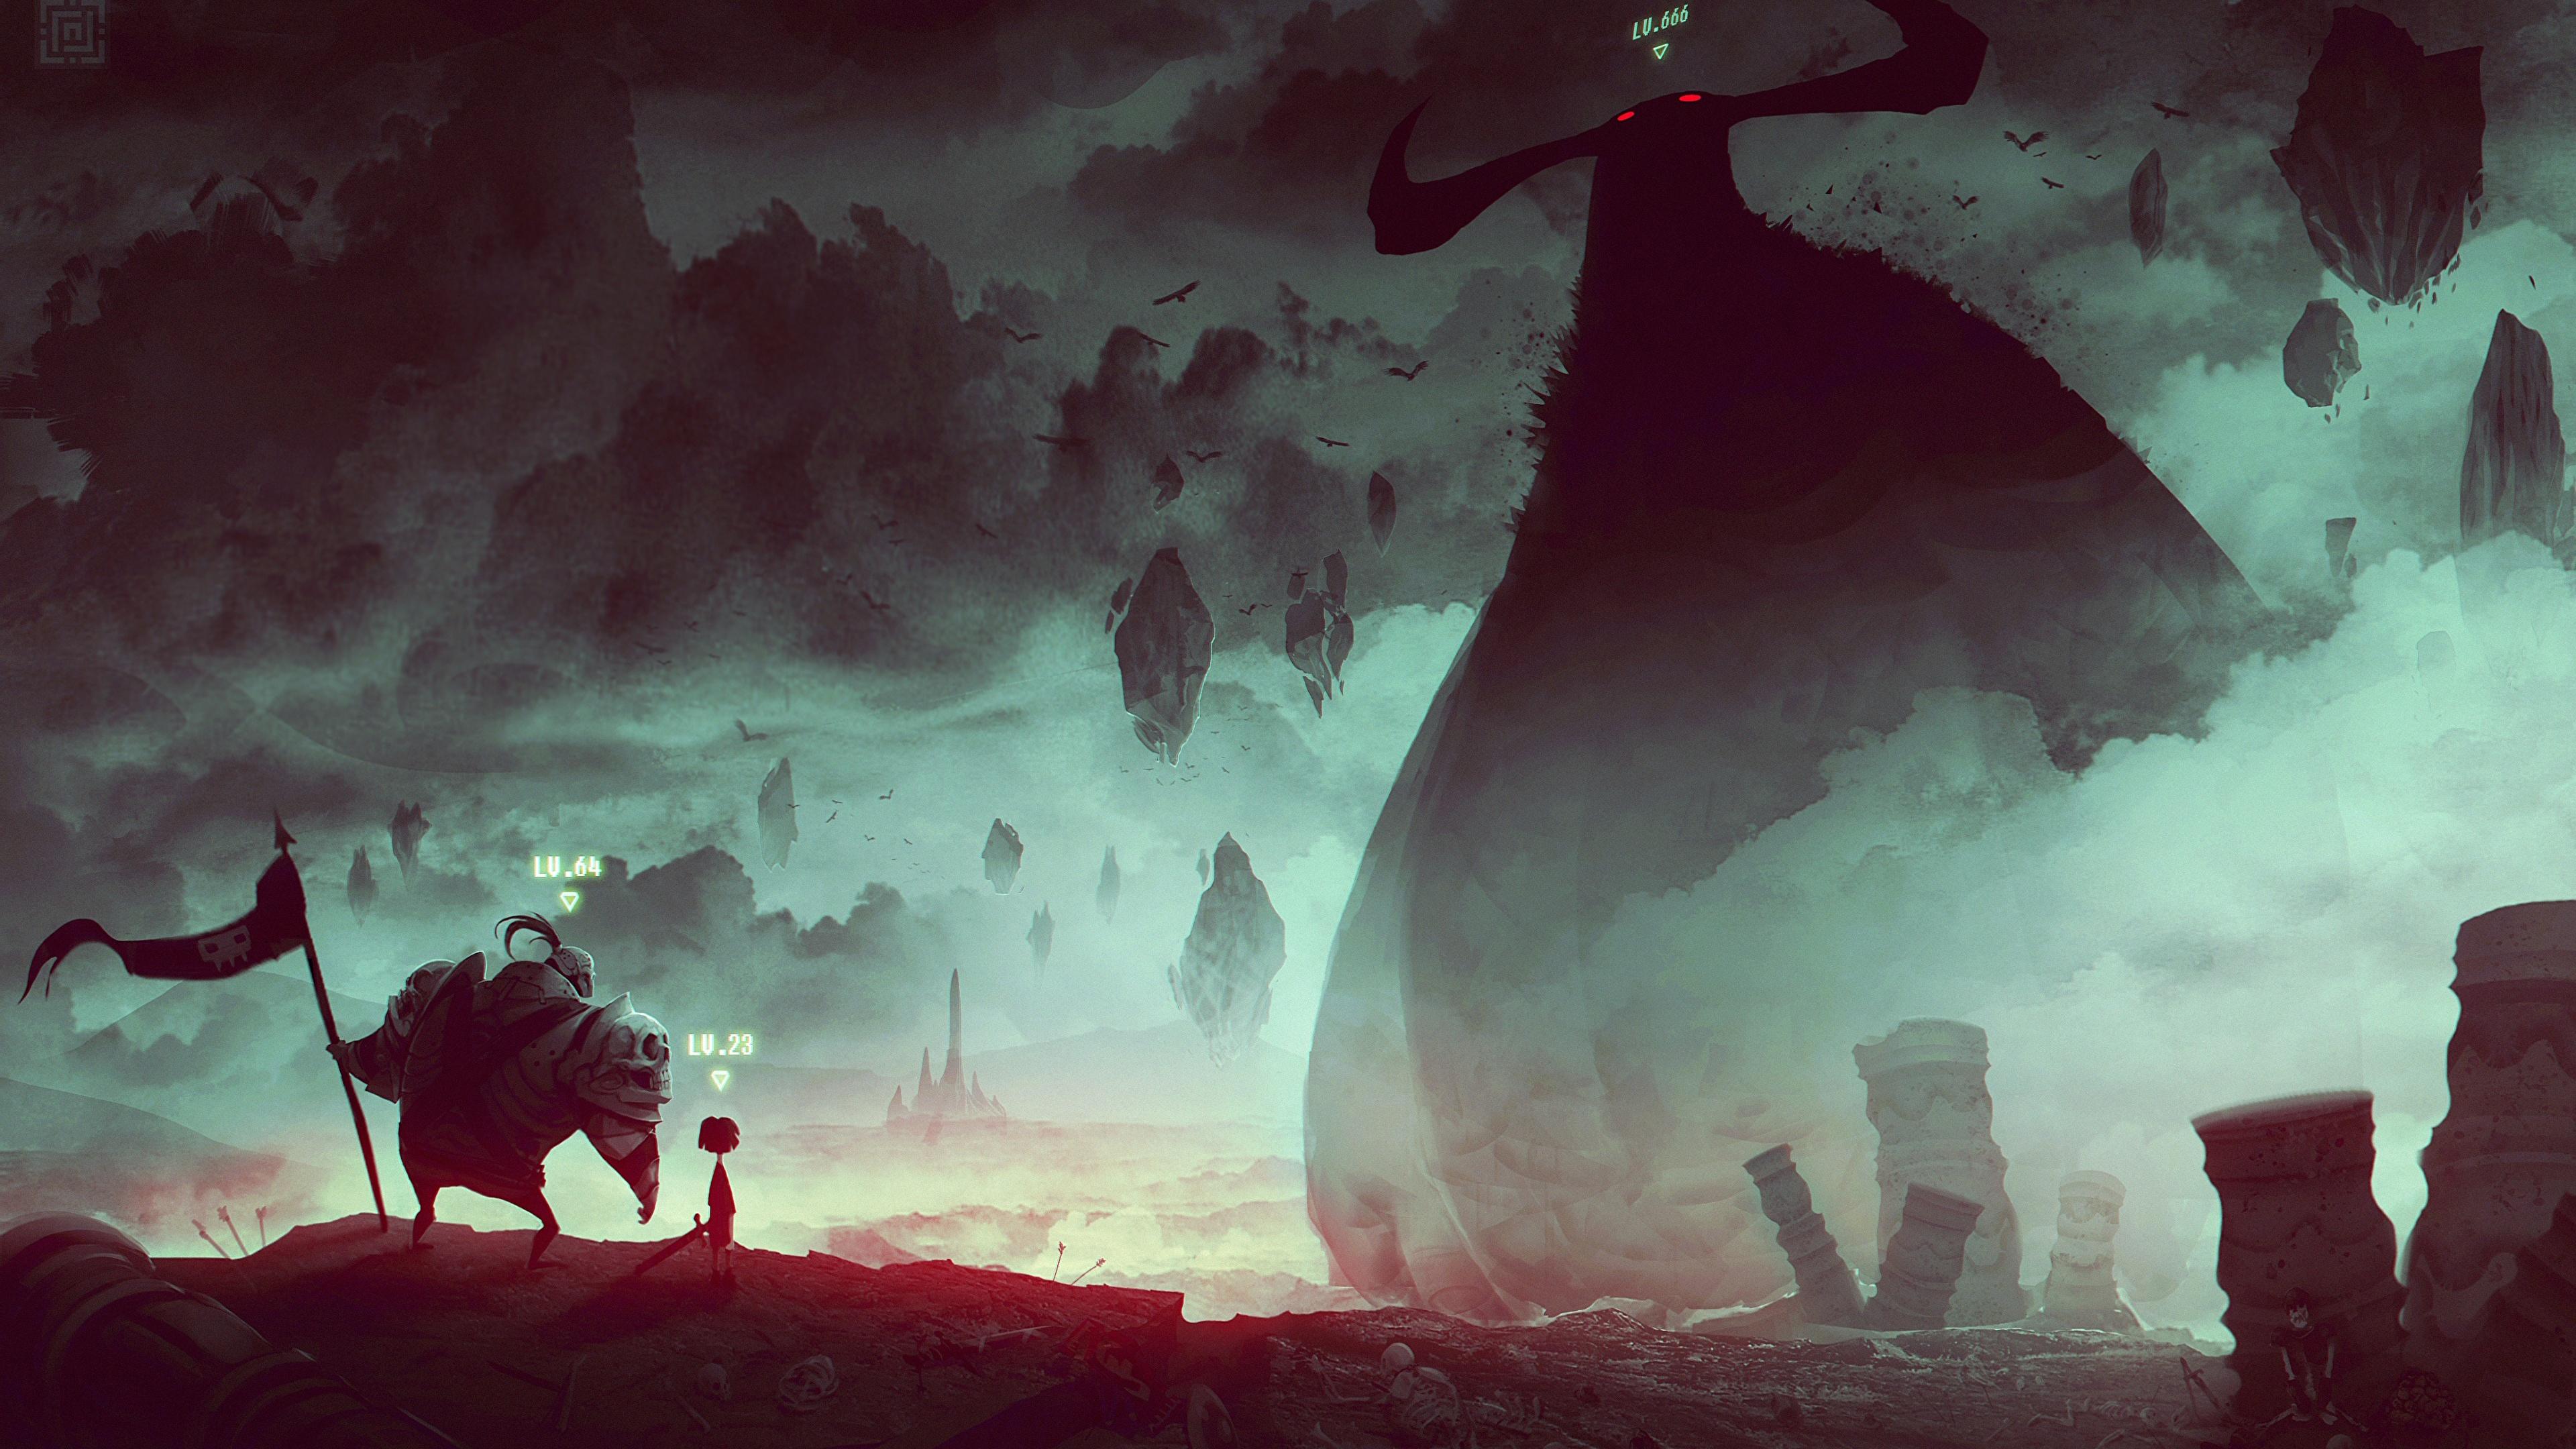 Картинка Монстры воин Фантастика Фантастический мир 3840x2160 монстр чудовище воины Воители Фэнтези